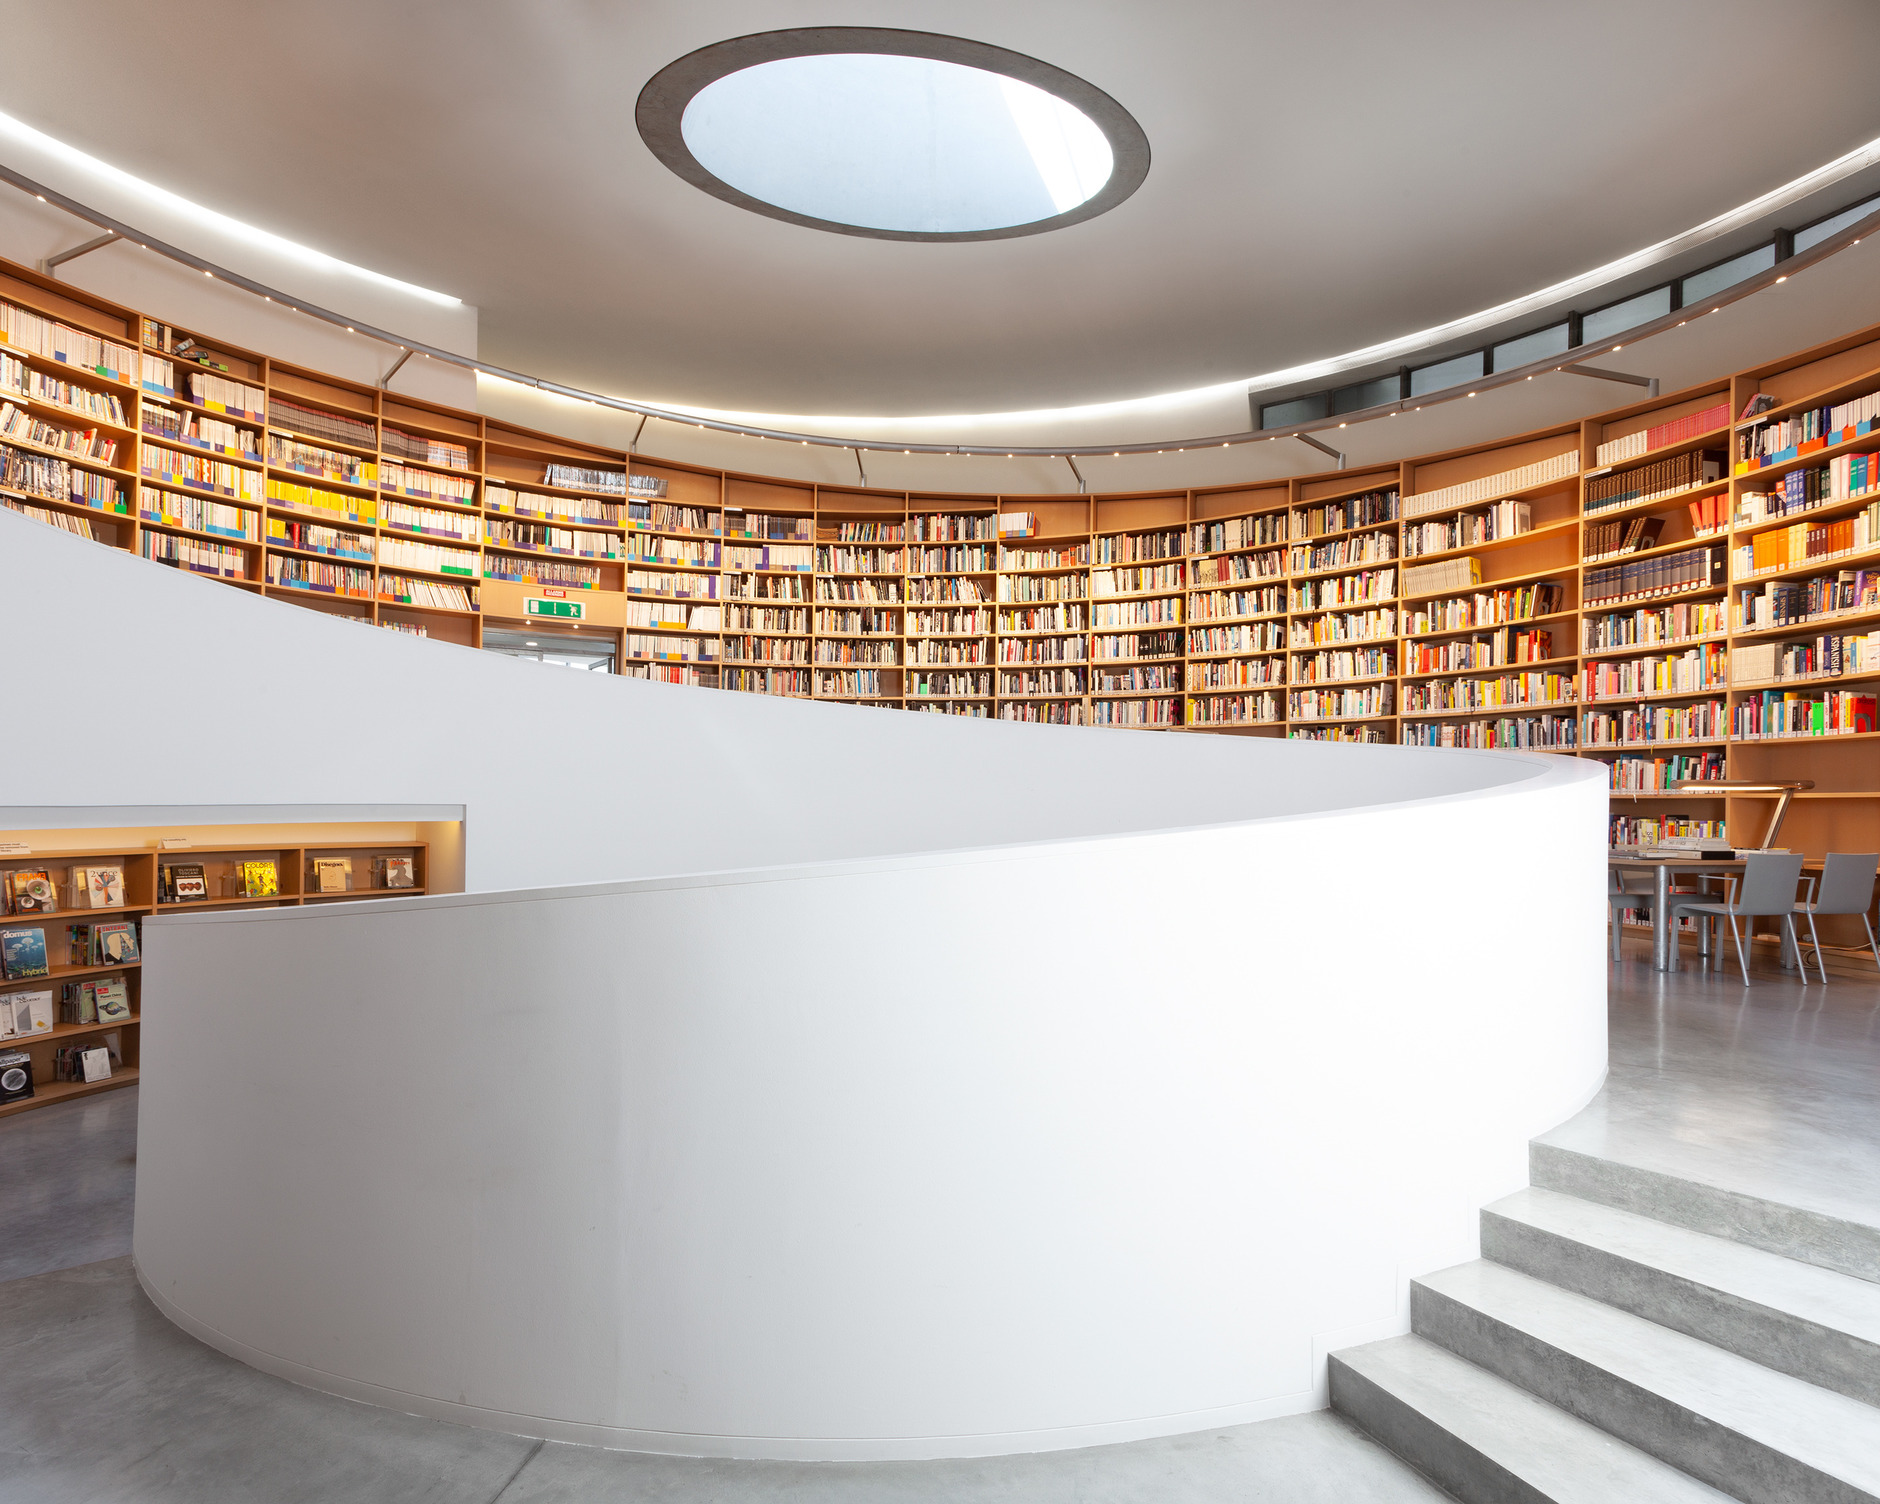 Архитектор Тадао Андо: певец бетона (галерея 15, фото 5)